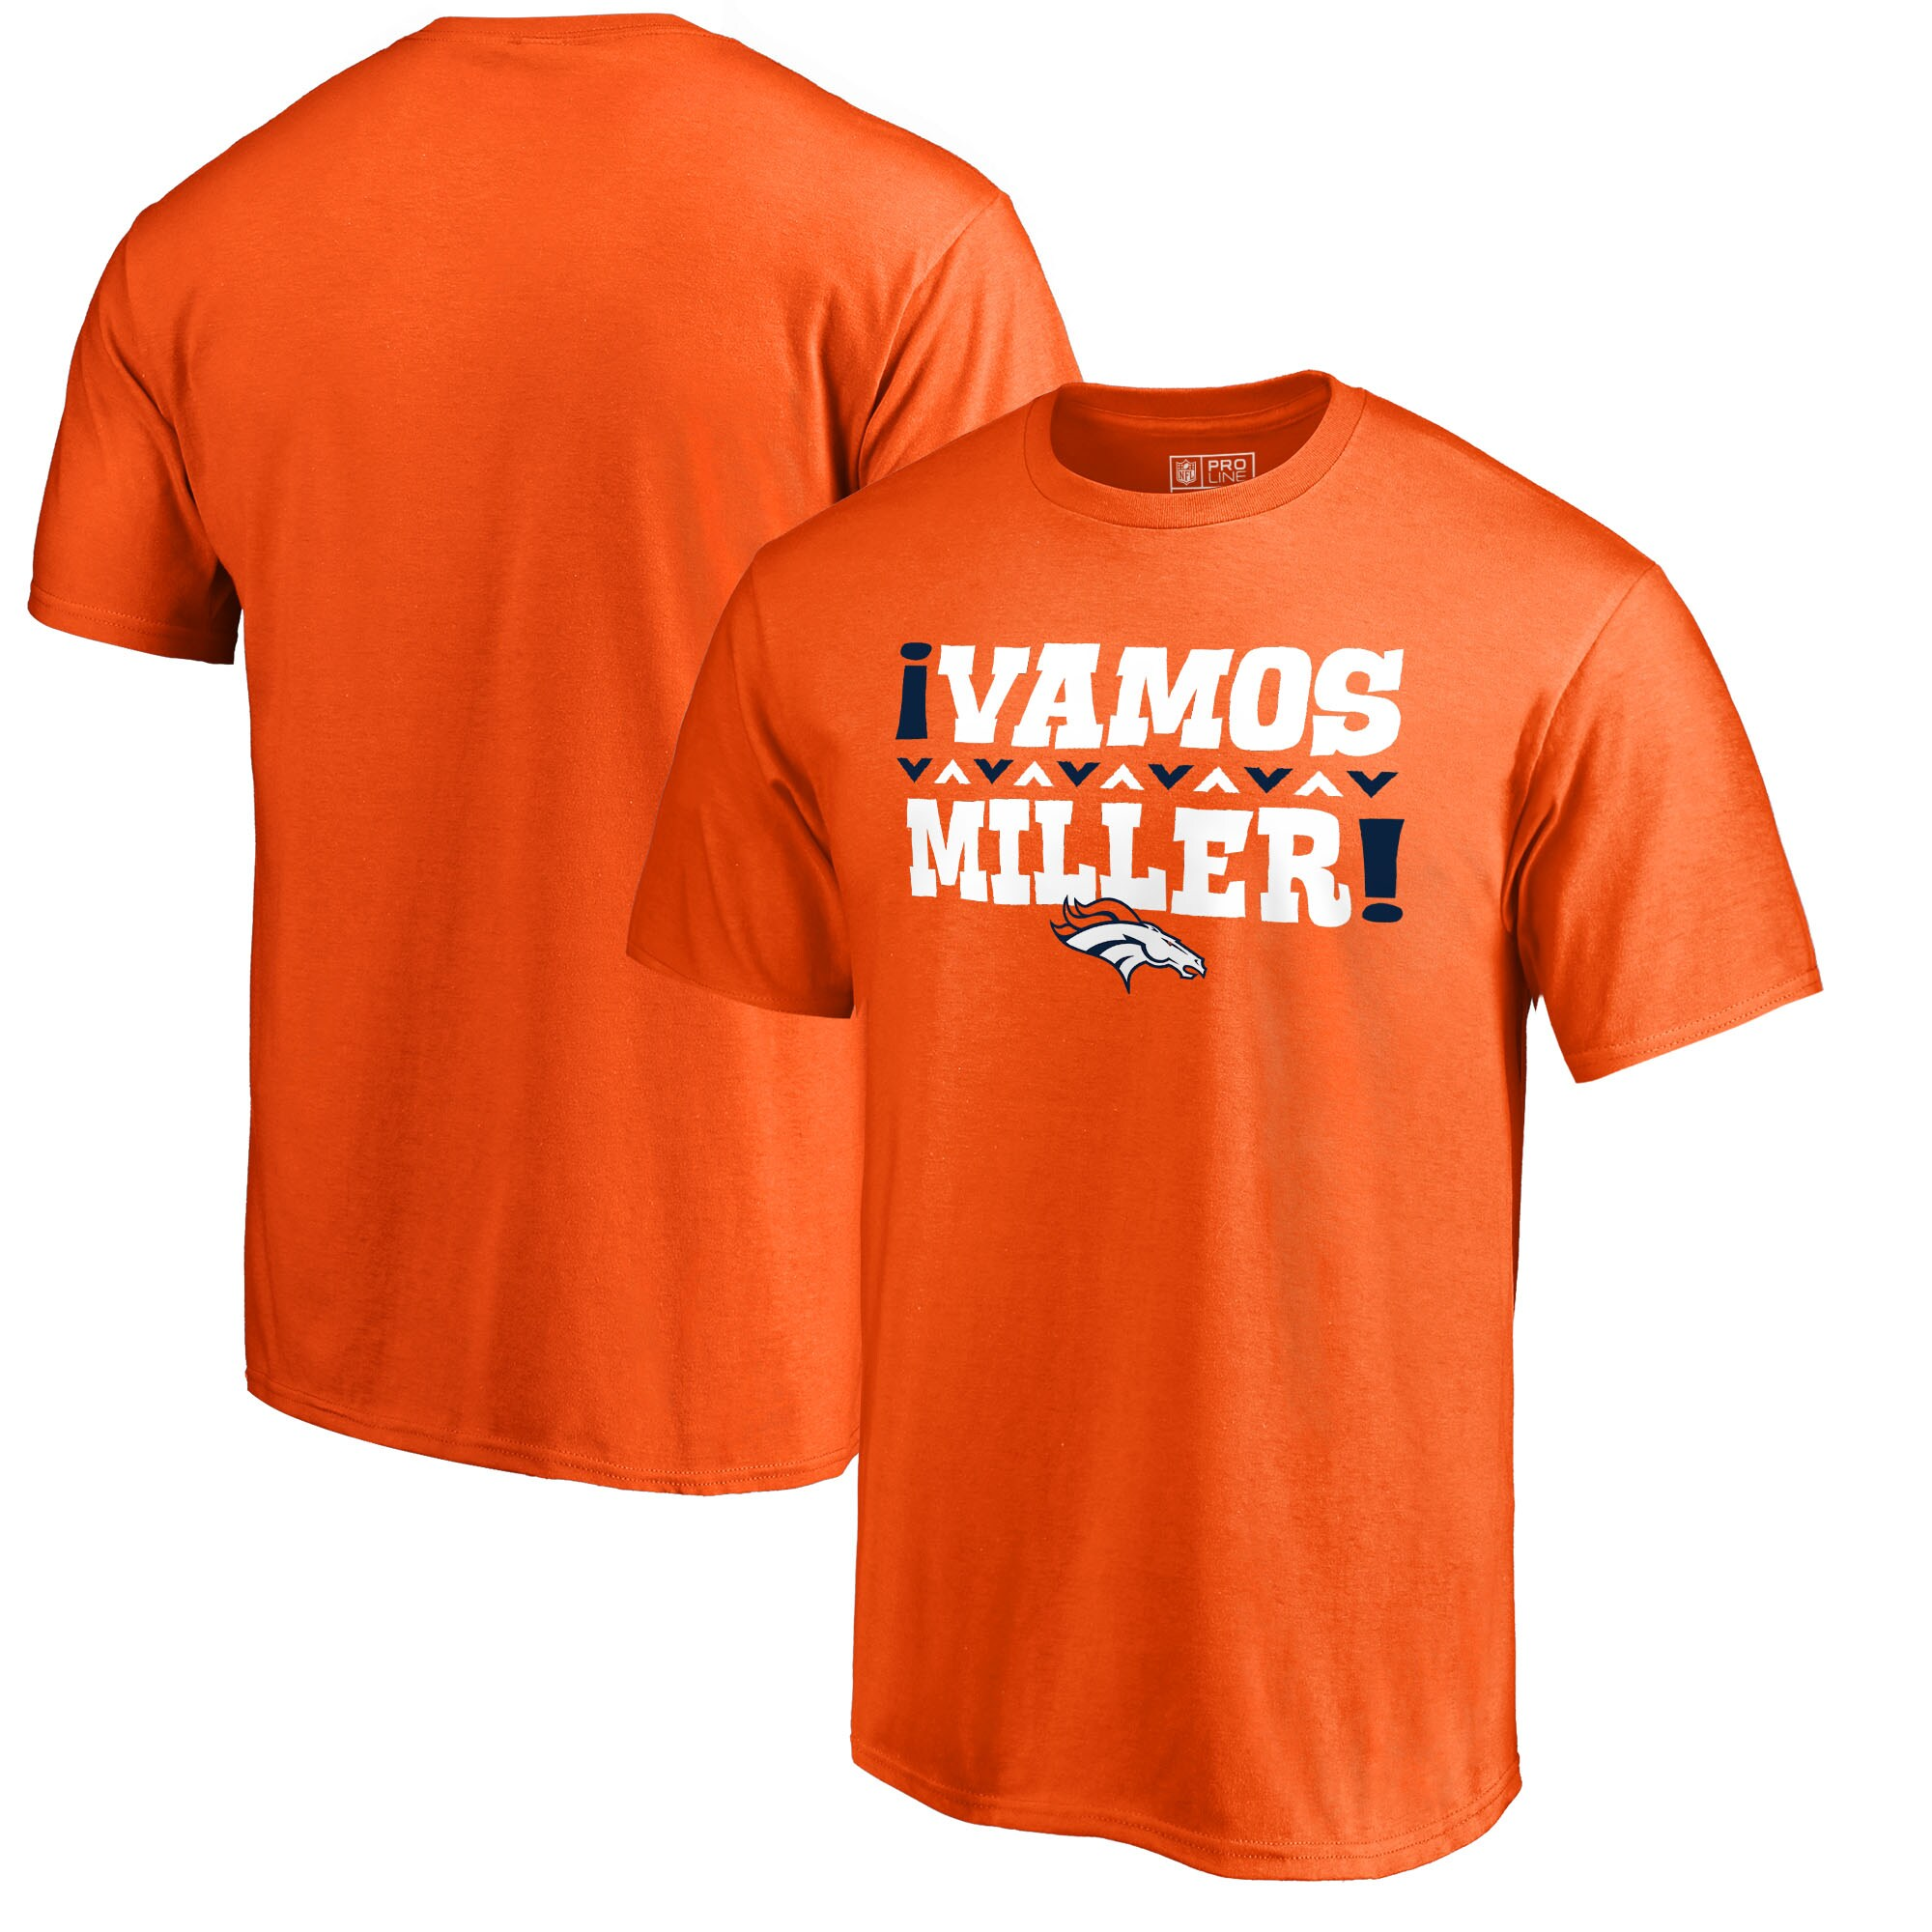 Von Miller Denver Broncos NFL Pro Line by Fanatics Branded Vamos T-Shirt - Orange